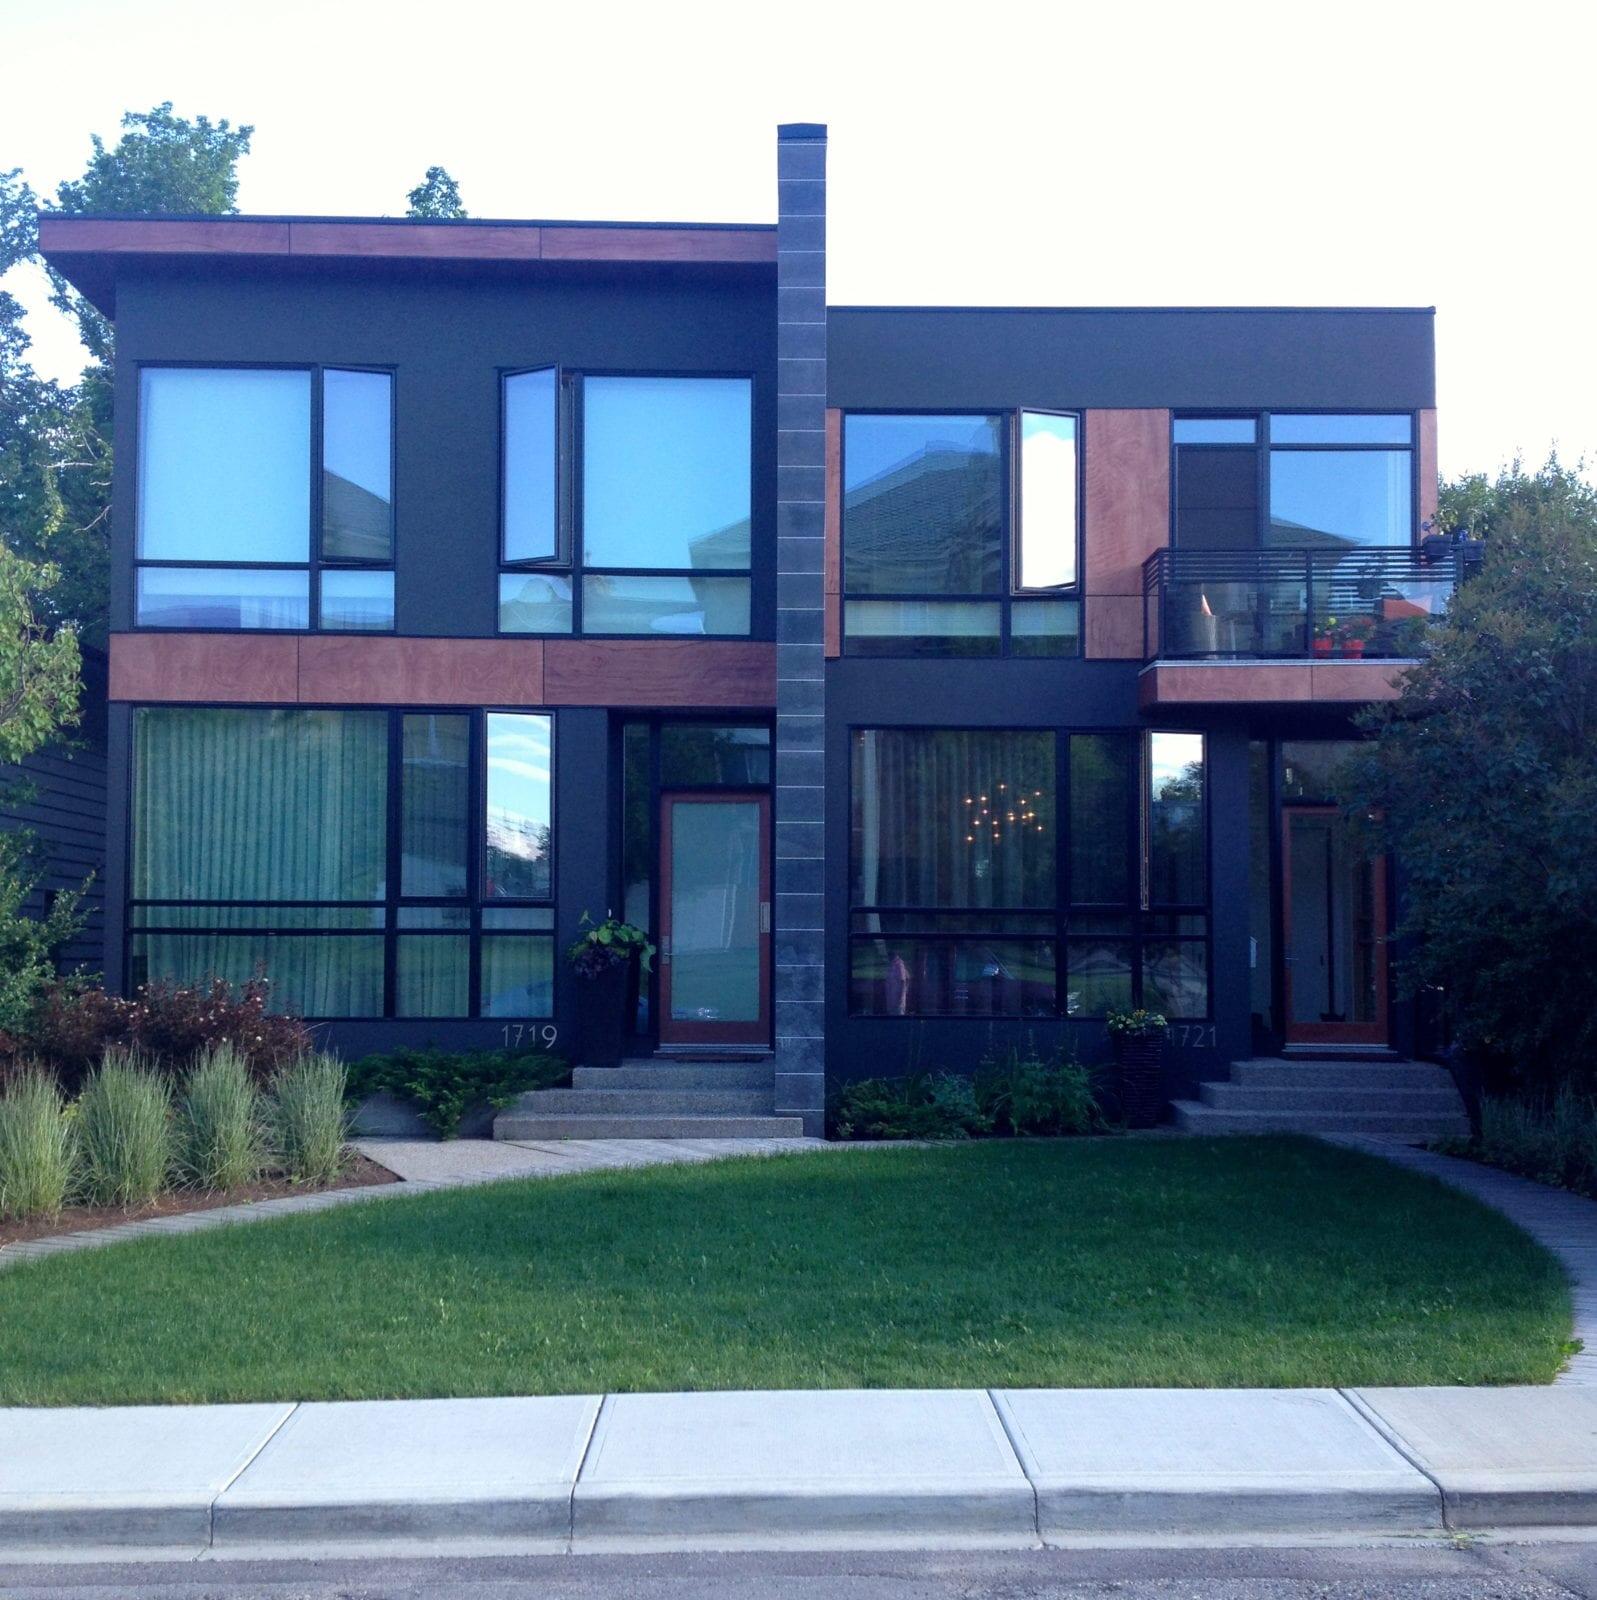 Street-Oriented Brownstones: Housing Choice